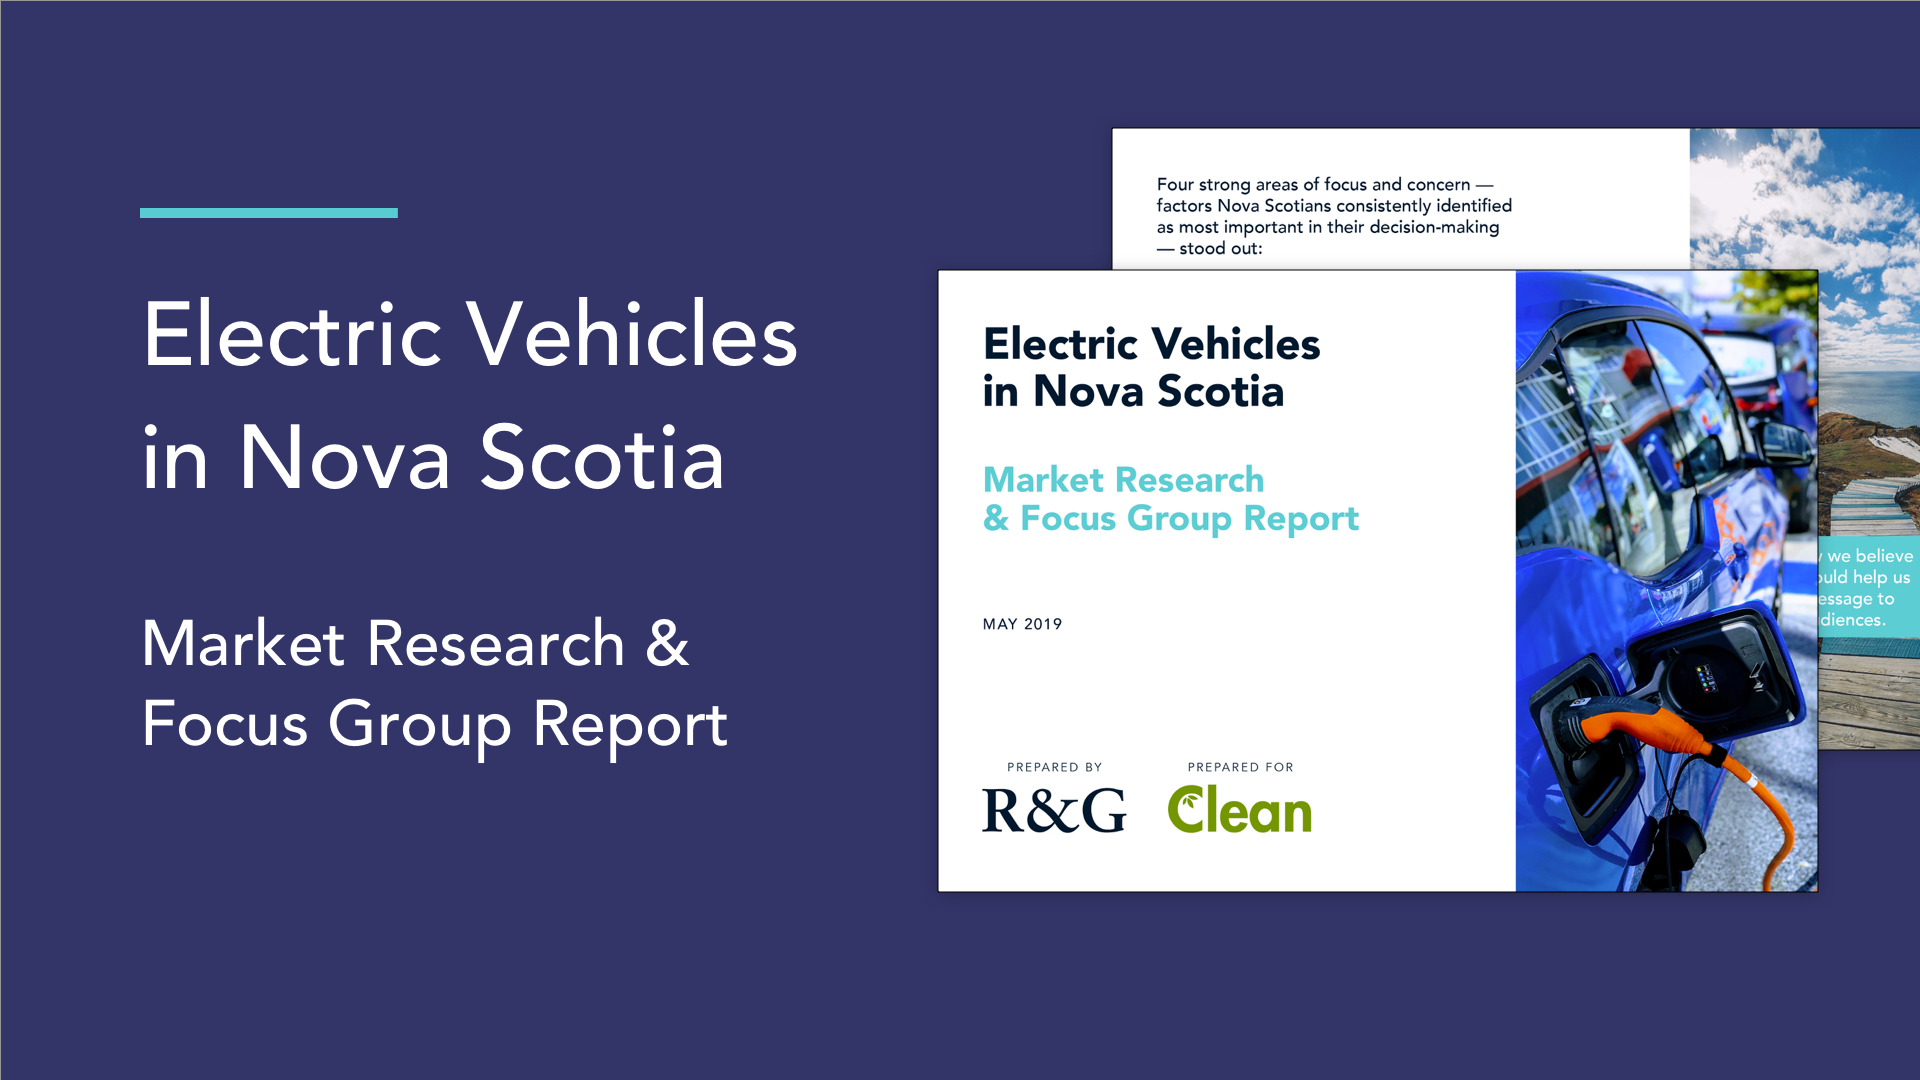 Electric Vehicles in Nova Scotia Market Research